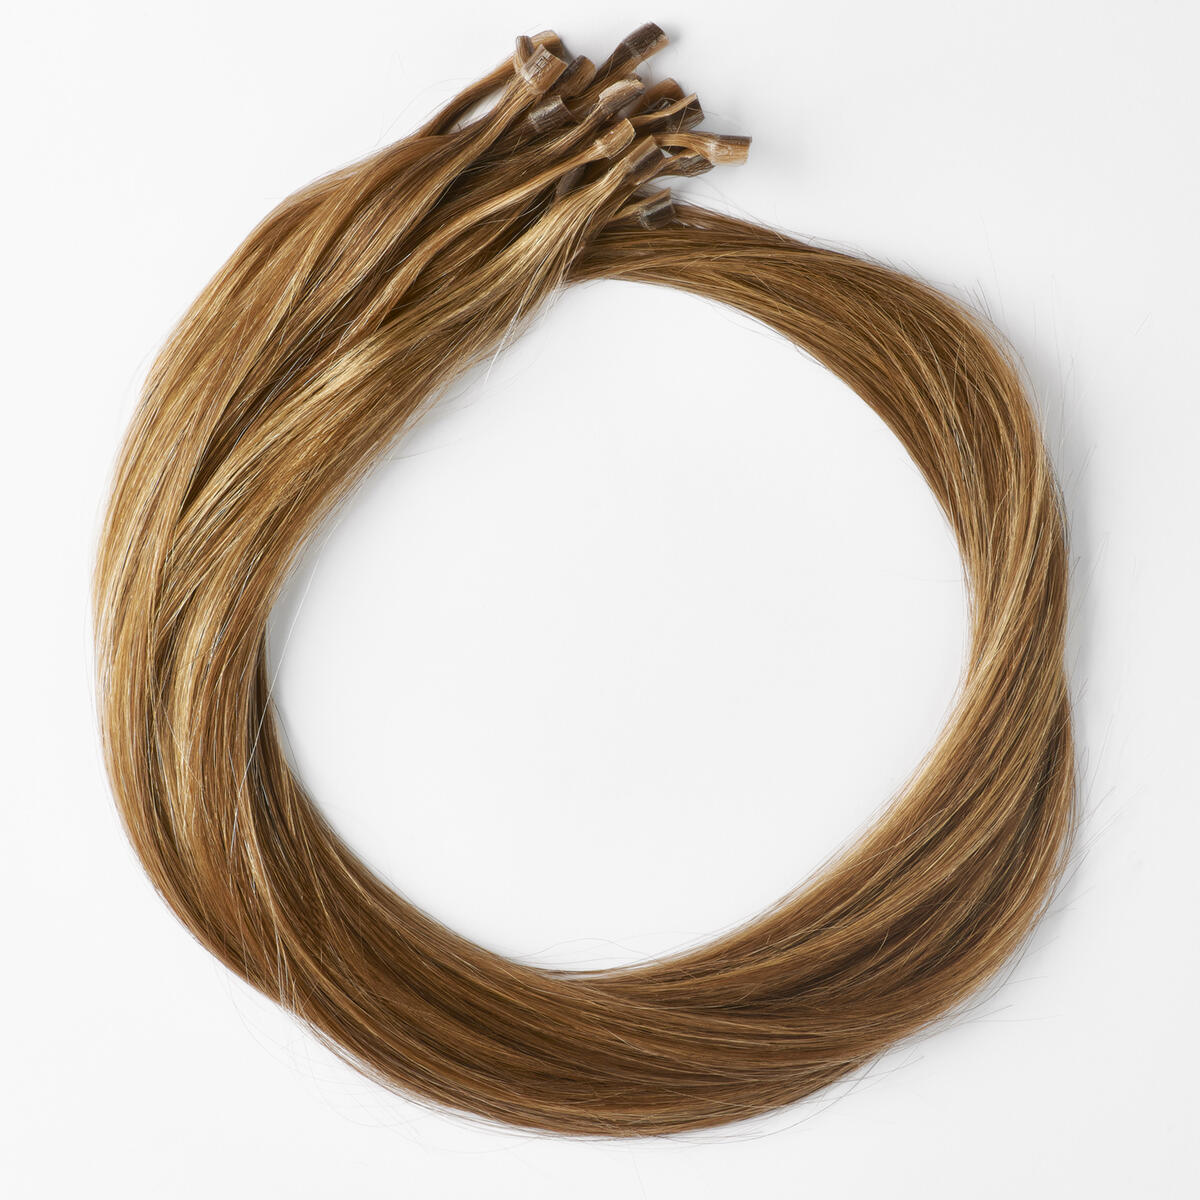 Nail Hair Premium Straight M5.0/7.4 Golden Brown Mix 50 cm